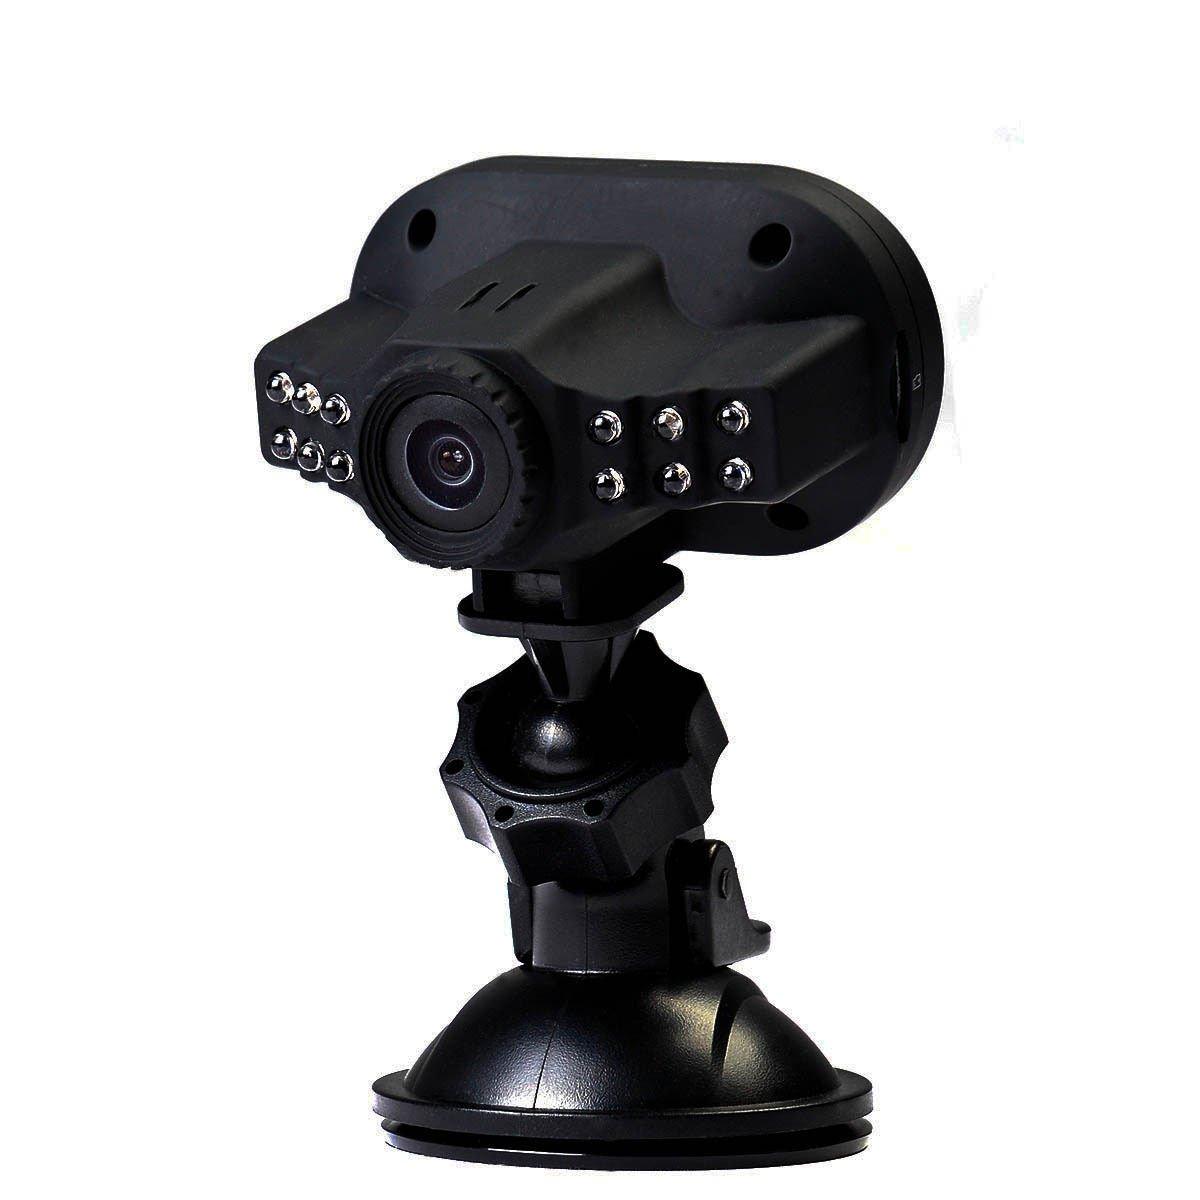 New 1.5 Full HD 1080P Car DVR Vehicle Camera Video Recorder Dash Cam G-sensor